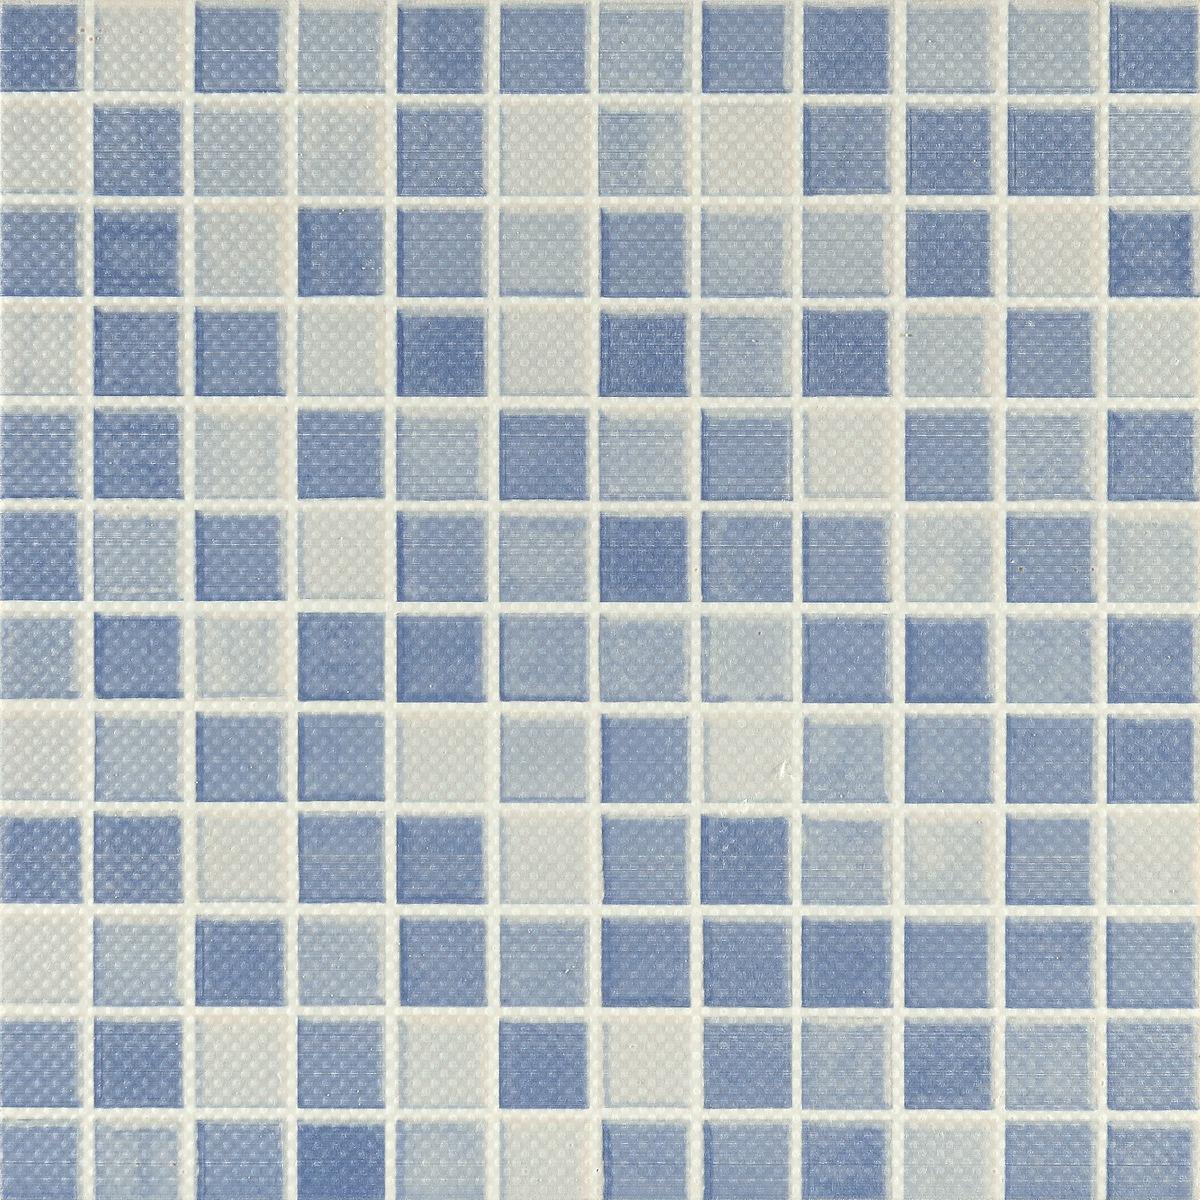 BDM EC Mosaic Blue